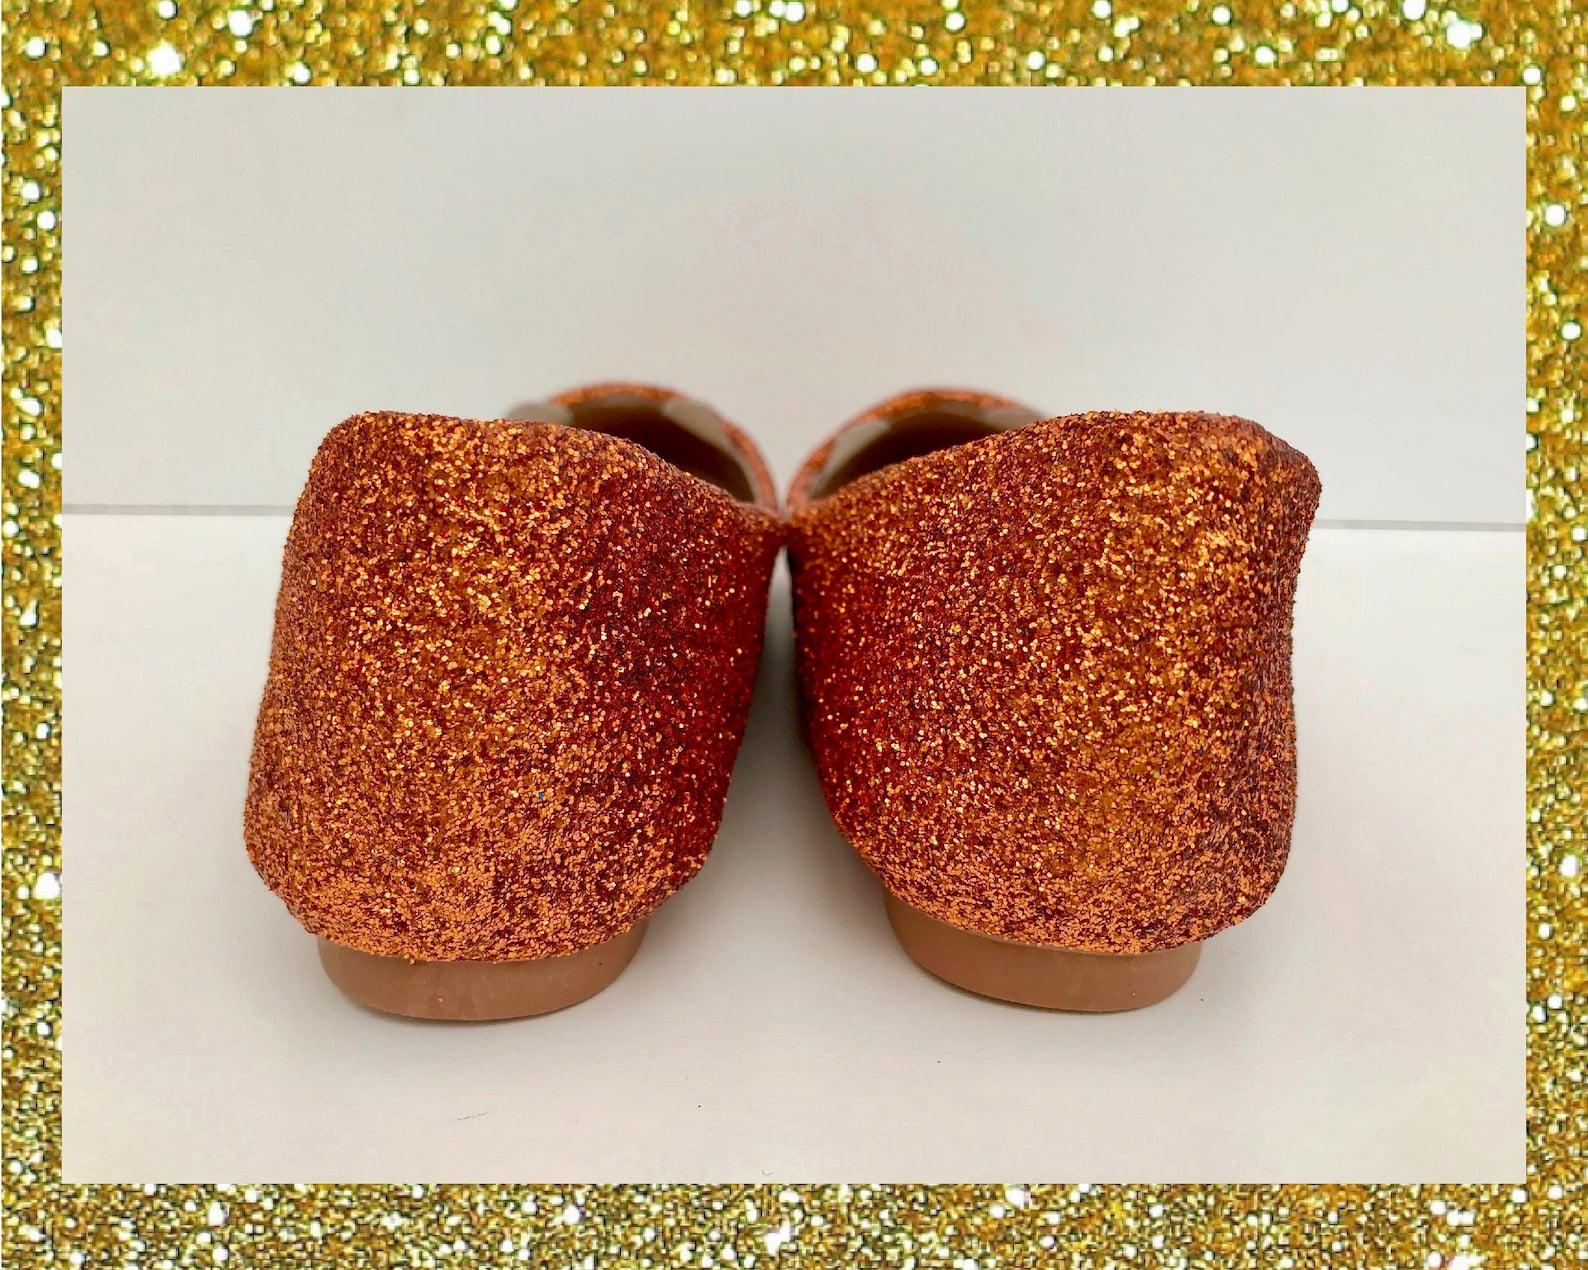 ginger cat ballet flats, cat glitter shoes, custom glitter flats, cute cat shoes womens, ginger tom gift, flat shoes for women,